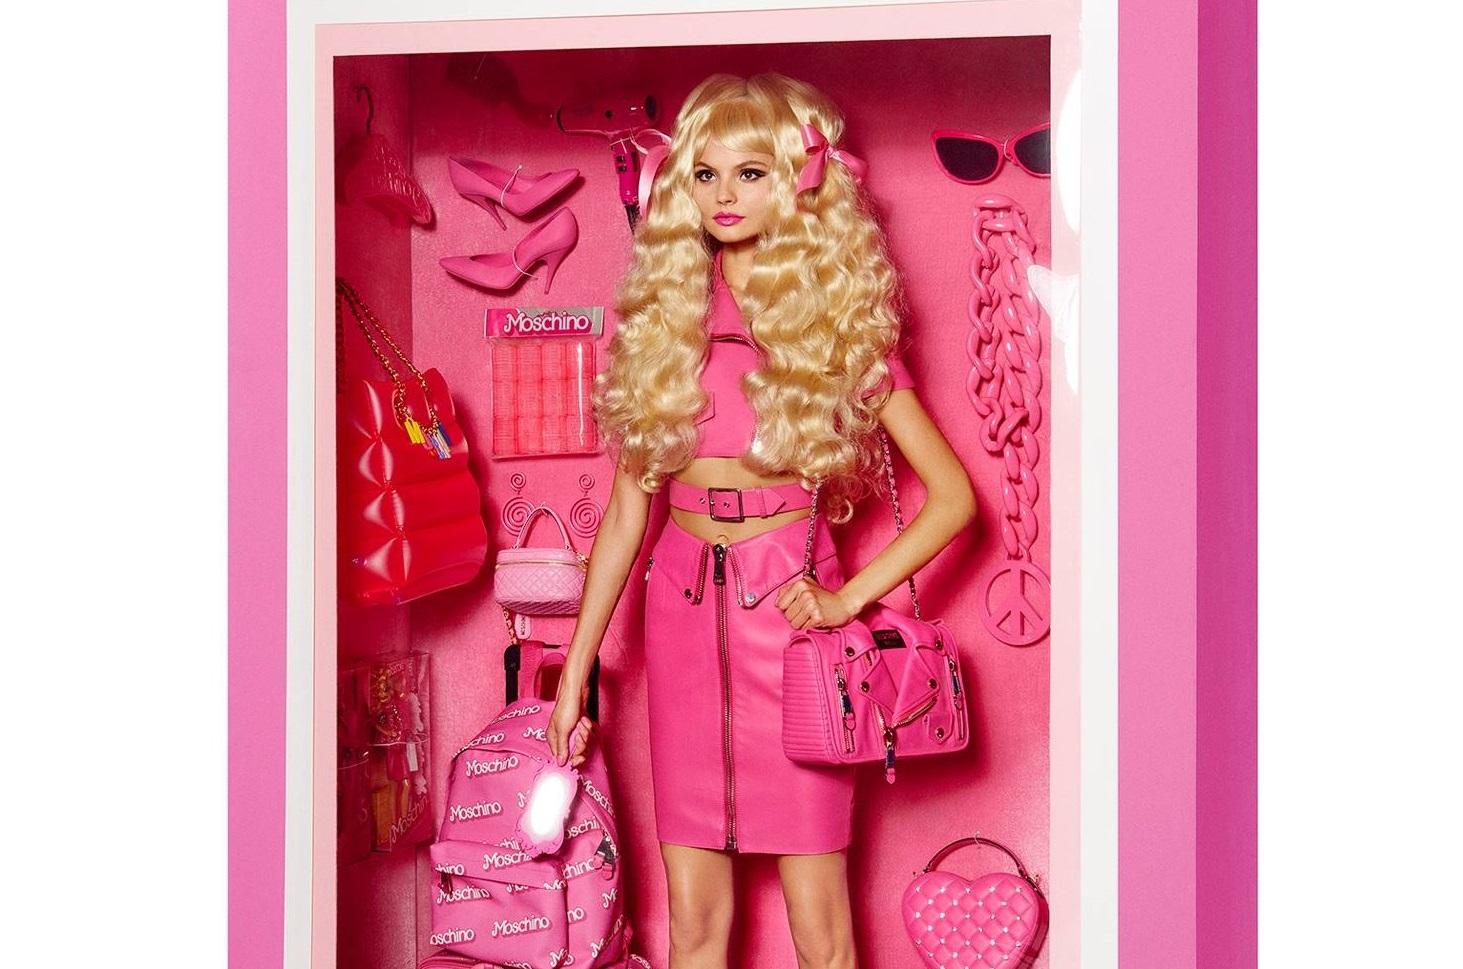 Modelle trasformate in Barbie13